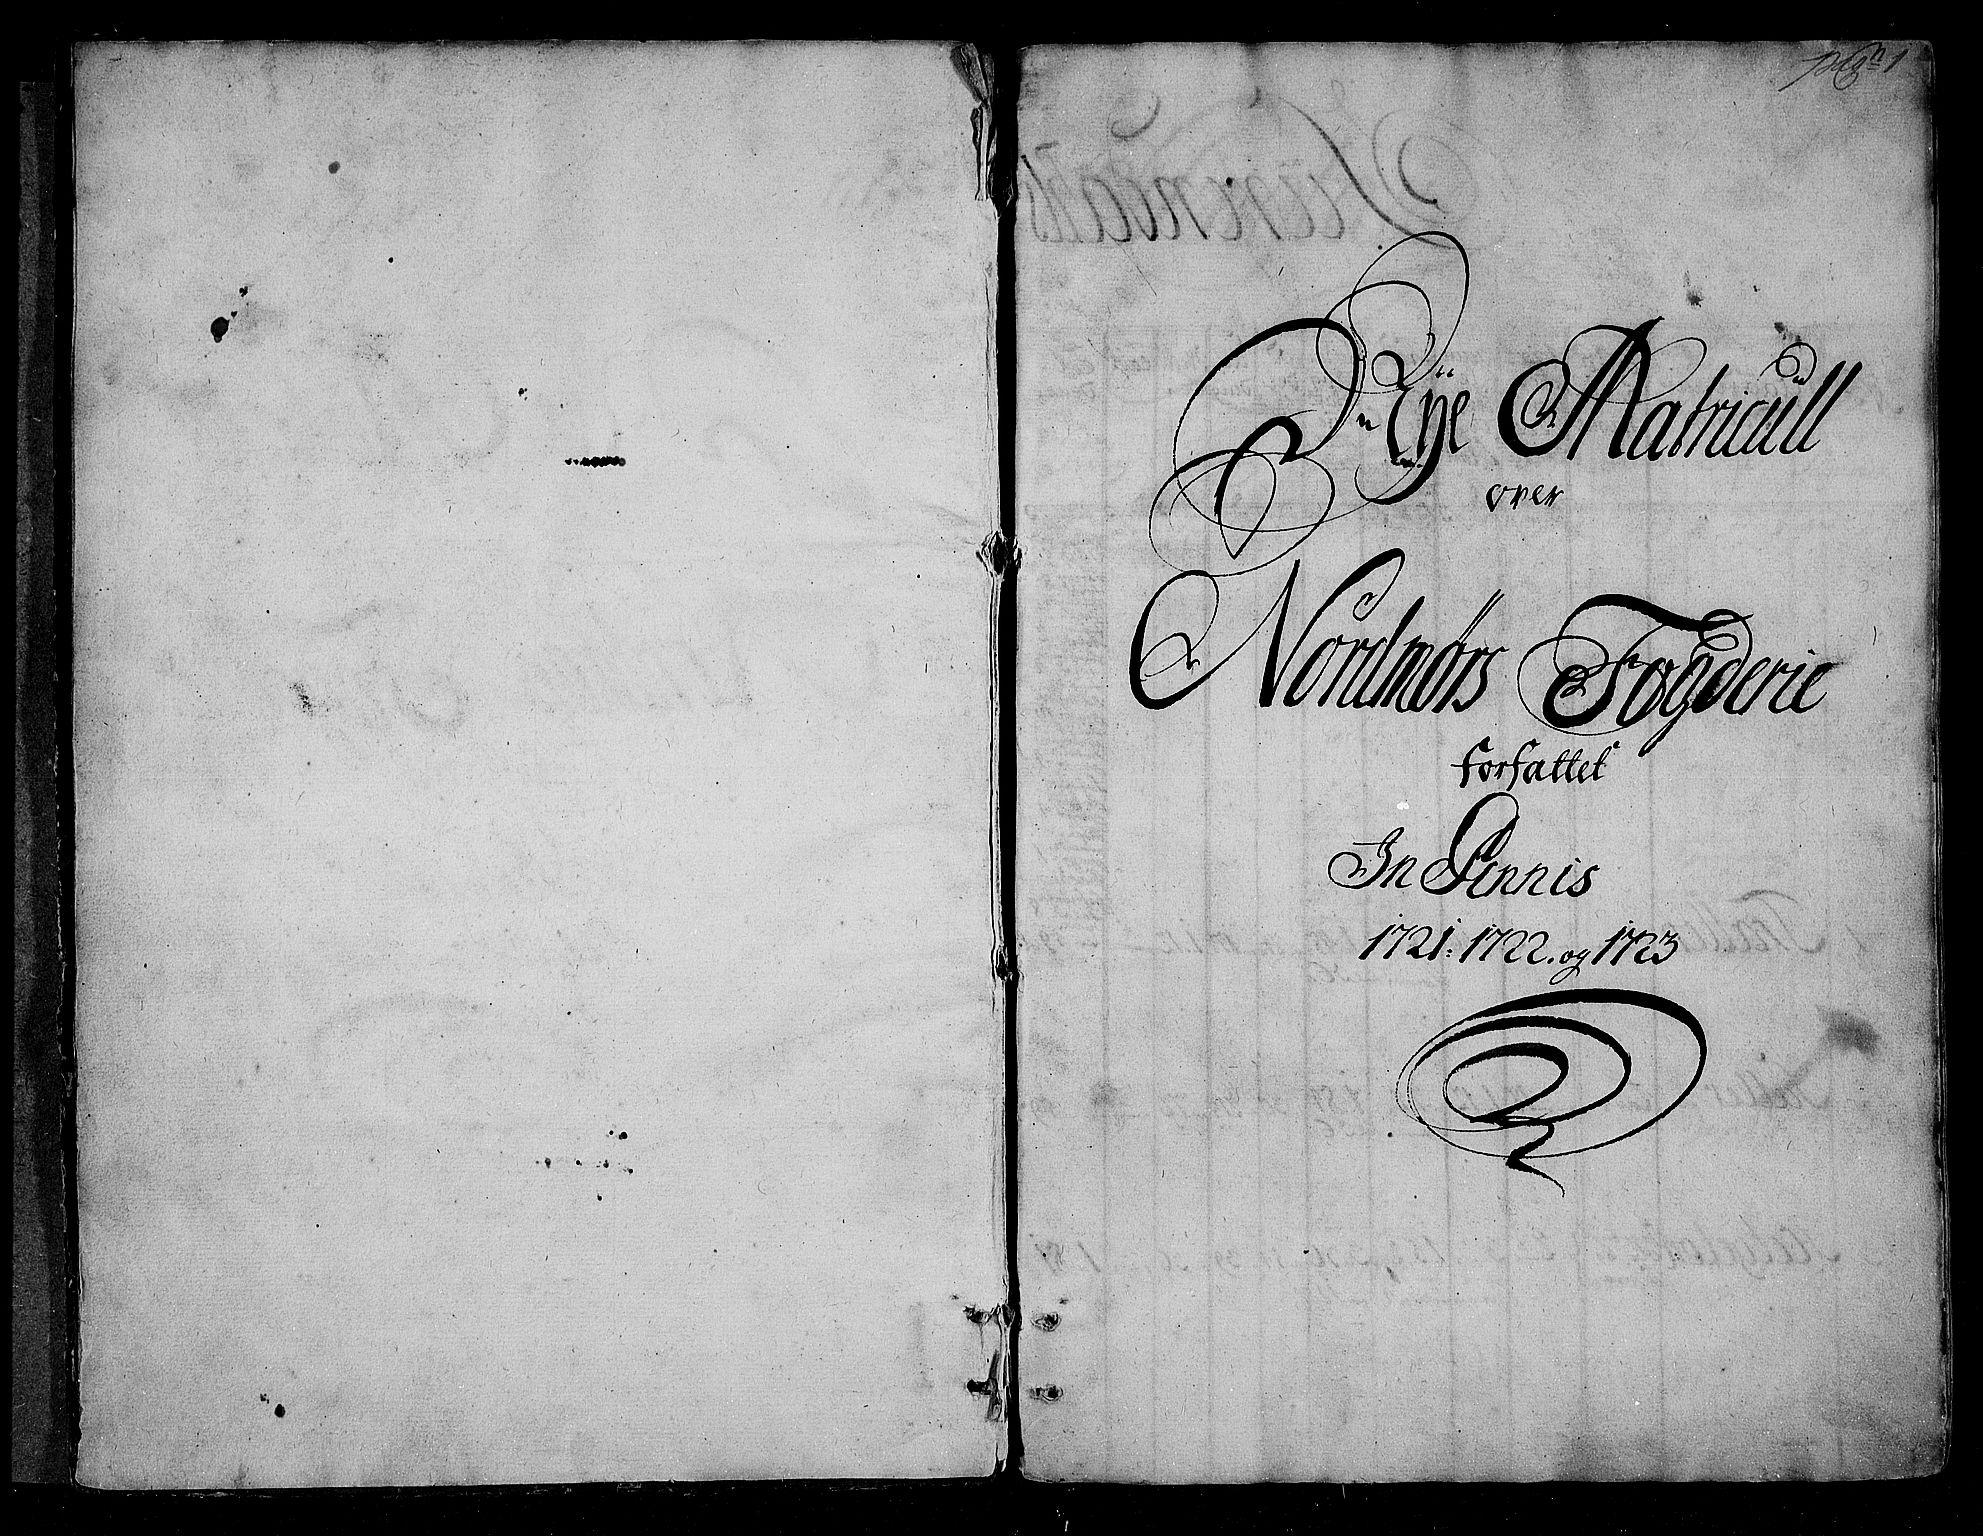 RA, Rentekammeret inntil 1814, Realistisk ordnet avdeling, N/Nb/Nbf/L0155: Nordmøre matrikkelprotokoll, 1721-1723, s. 1